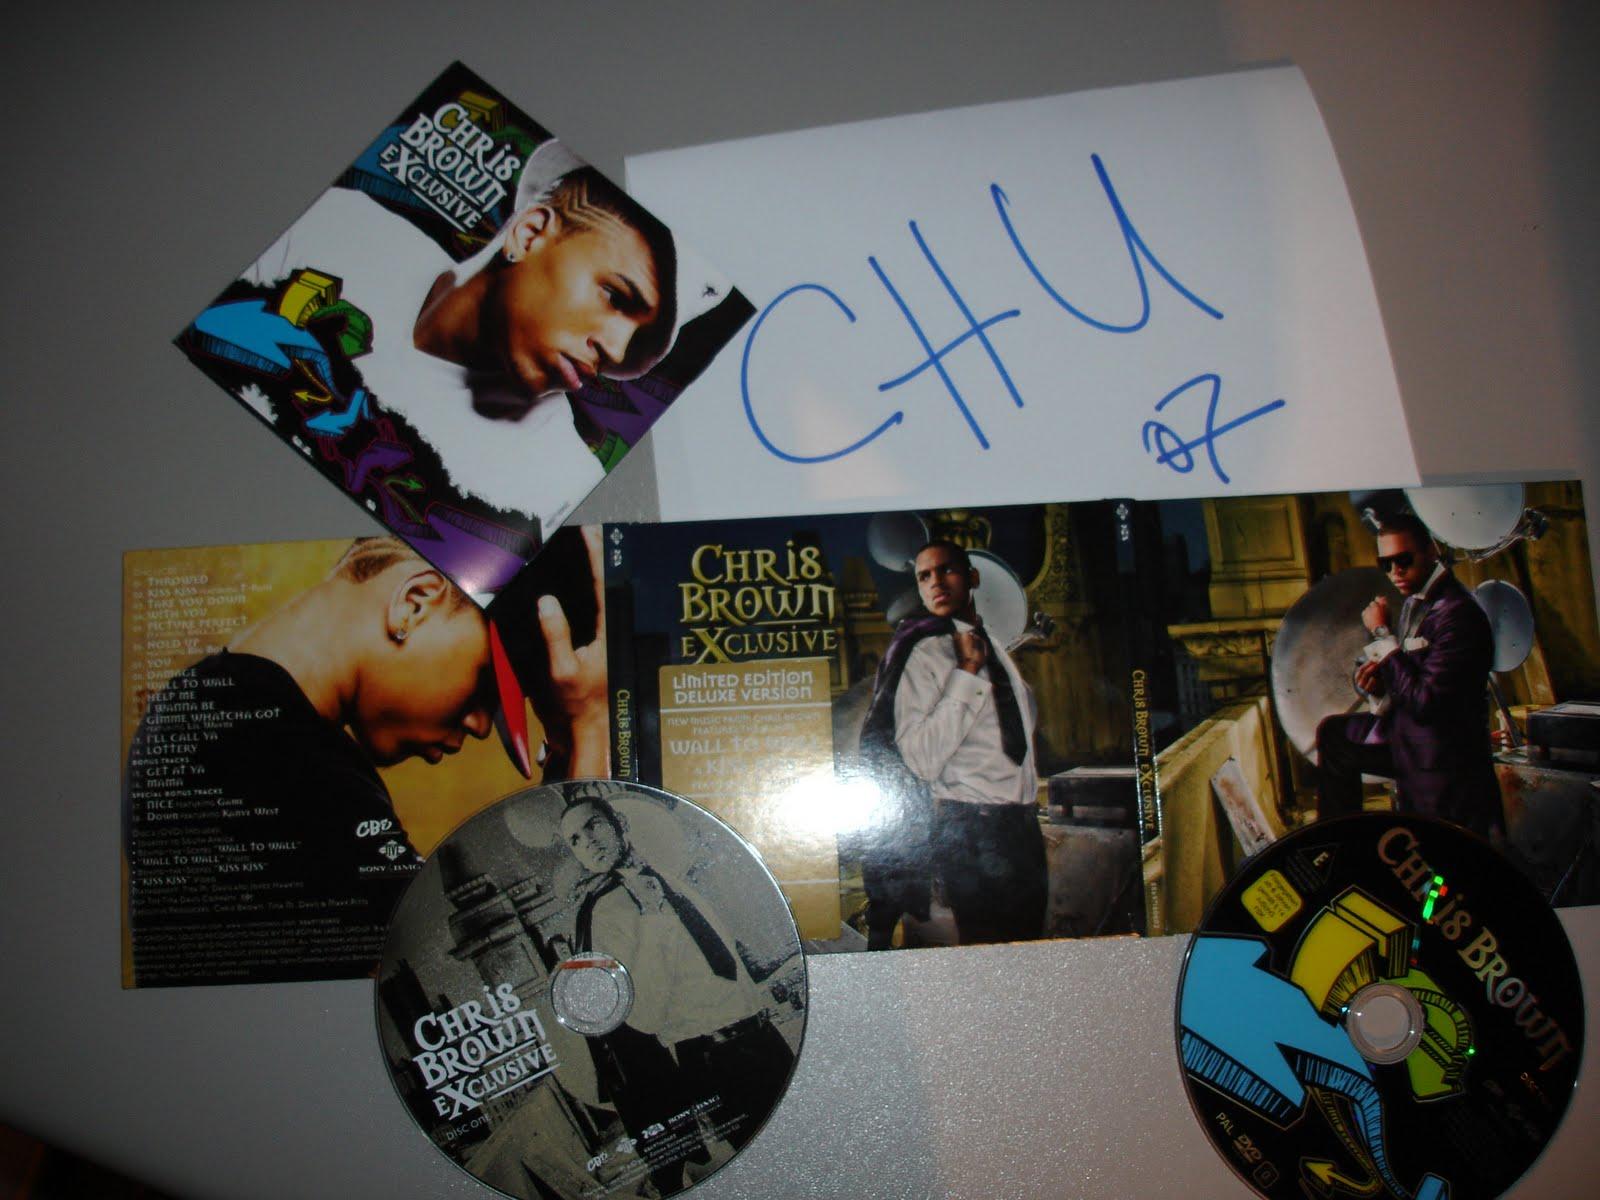 Chris Brown Discography Album Torrent Download